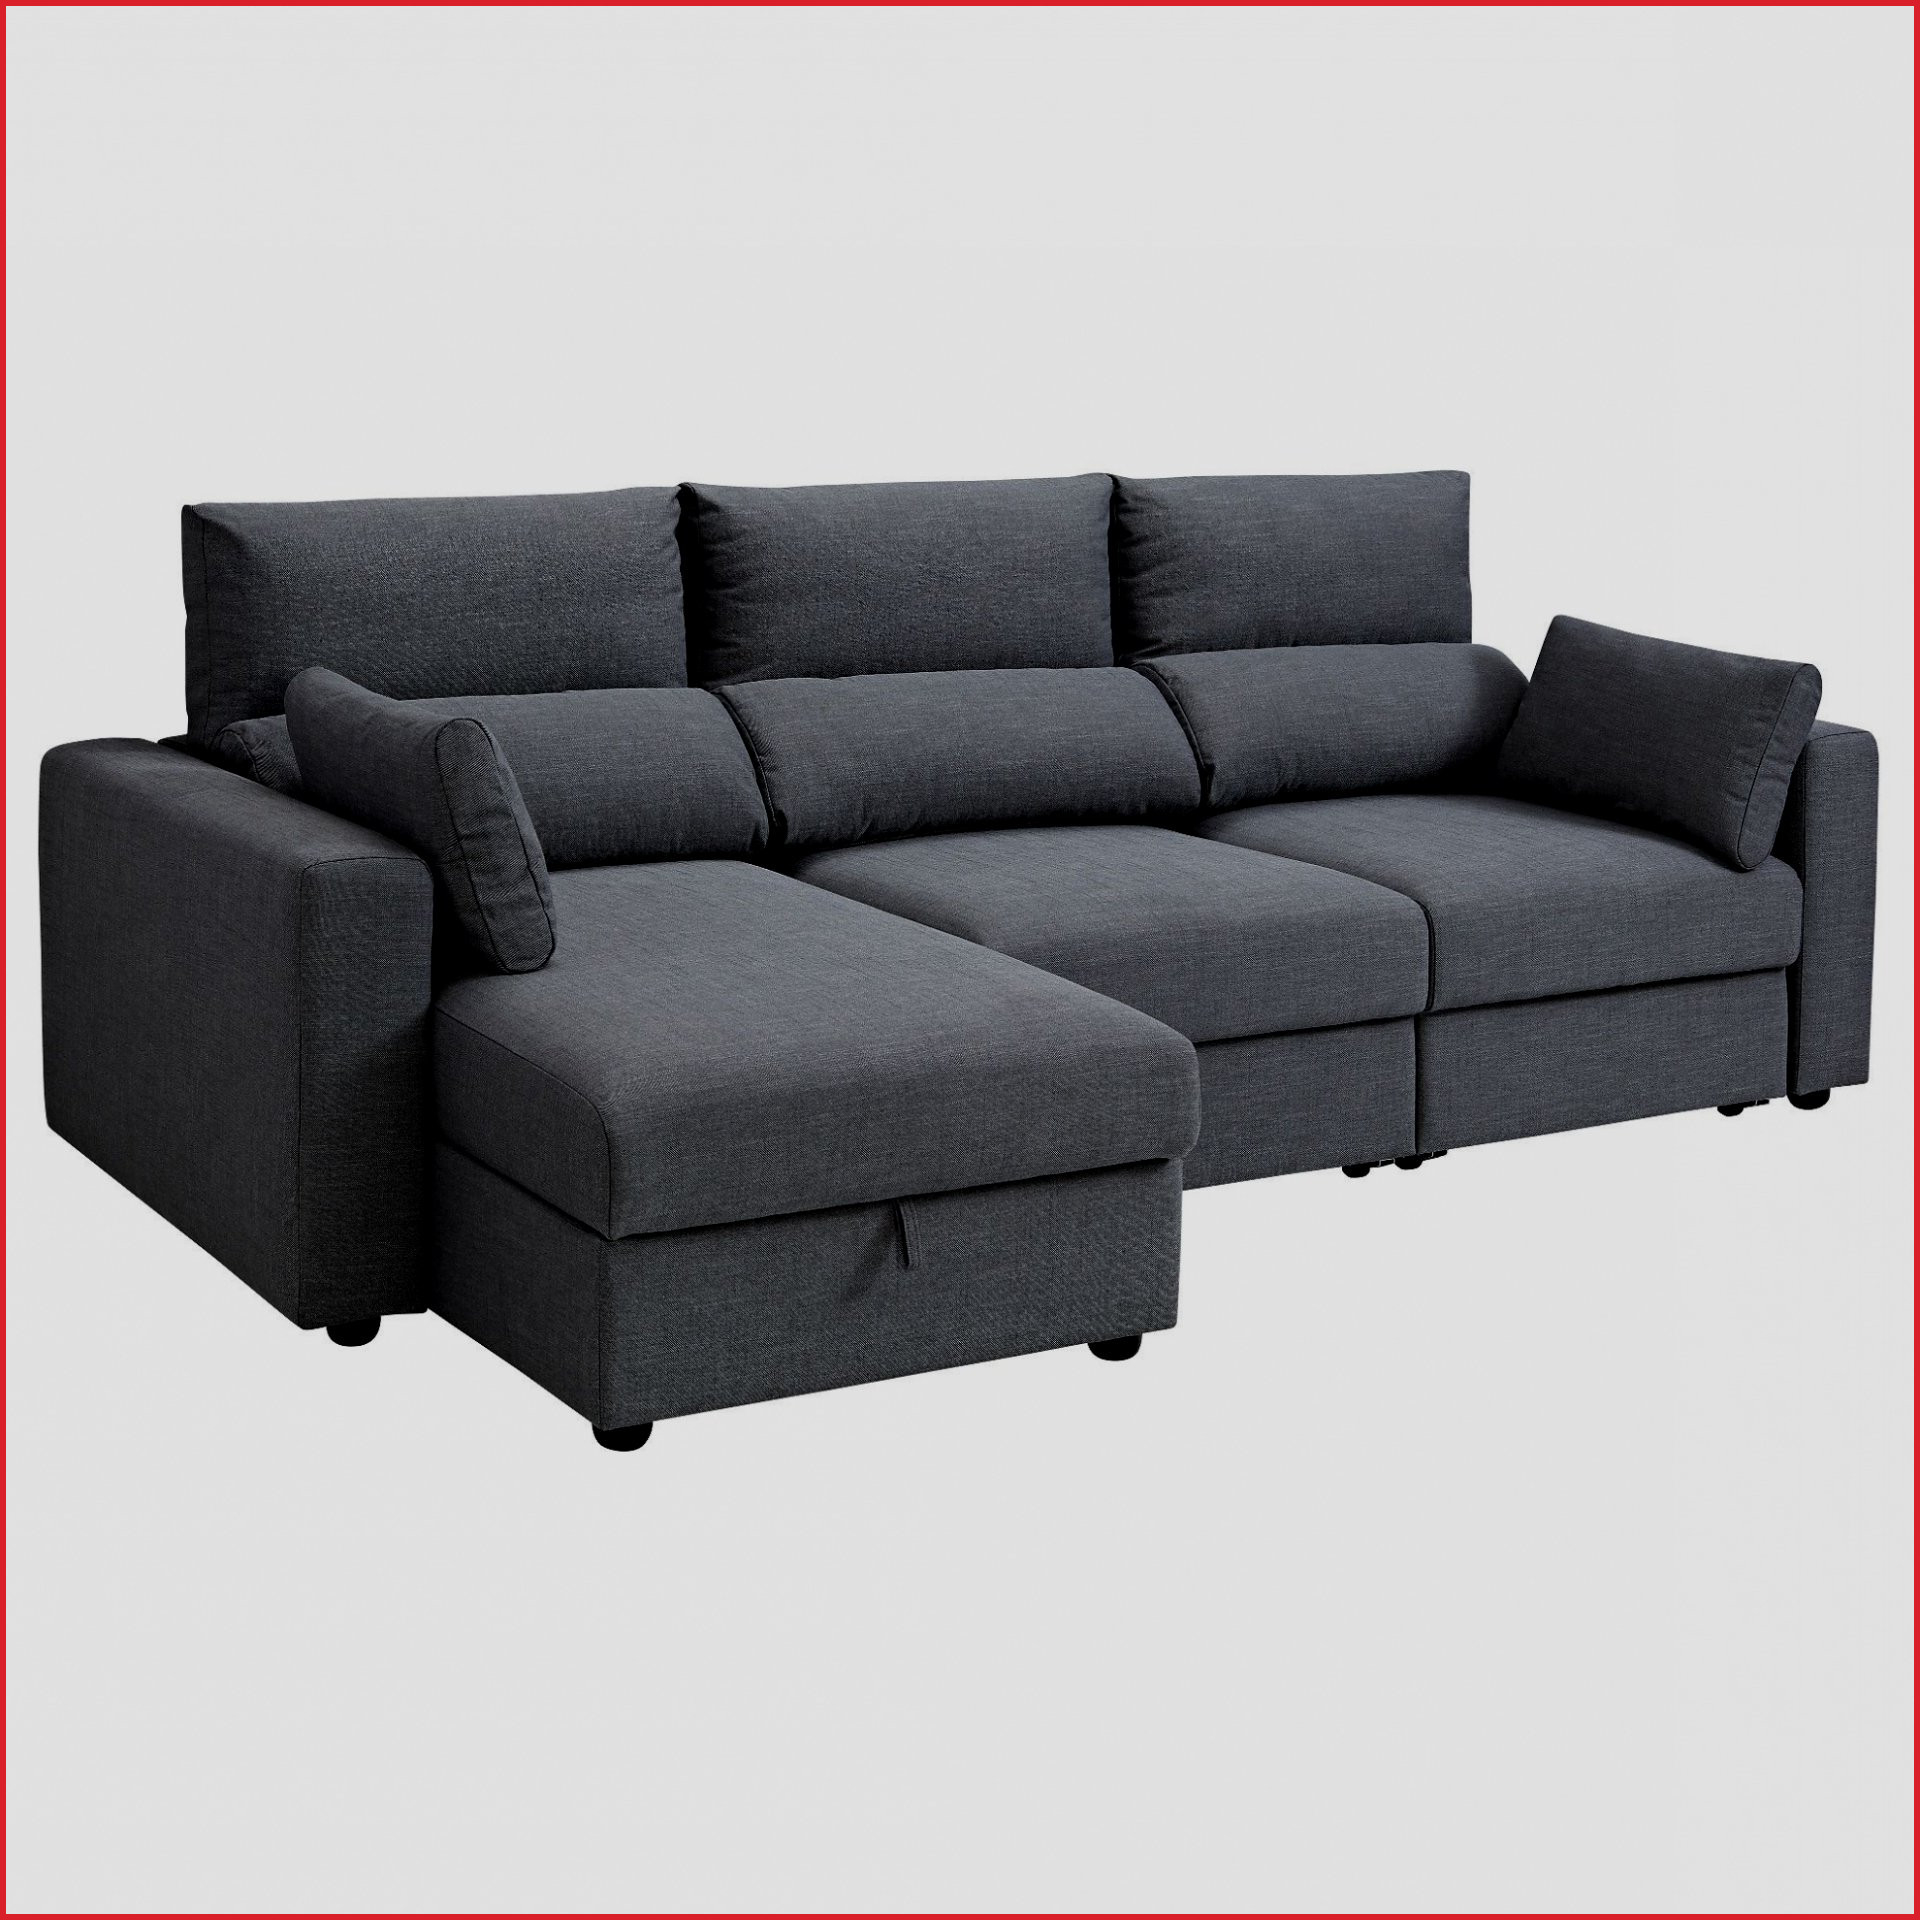 Sofa cama corte ingles las palmas baci living room - Muebles casal valencia ...